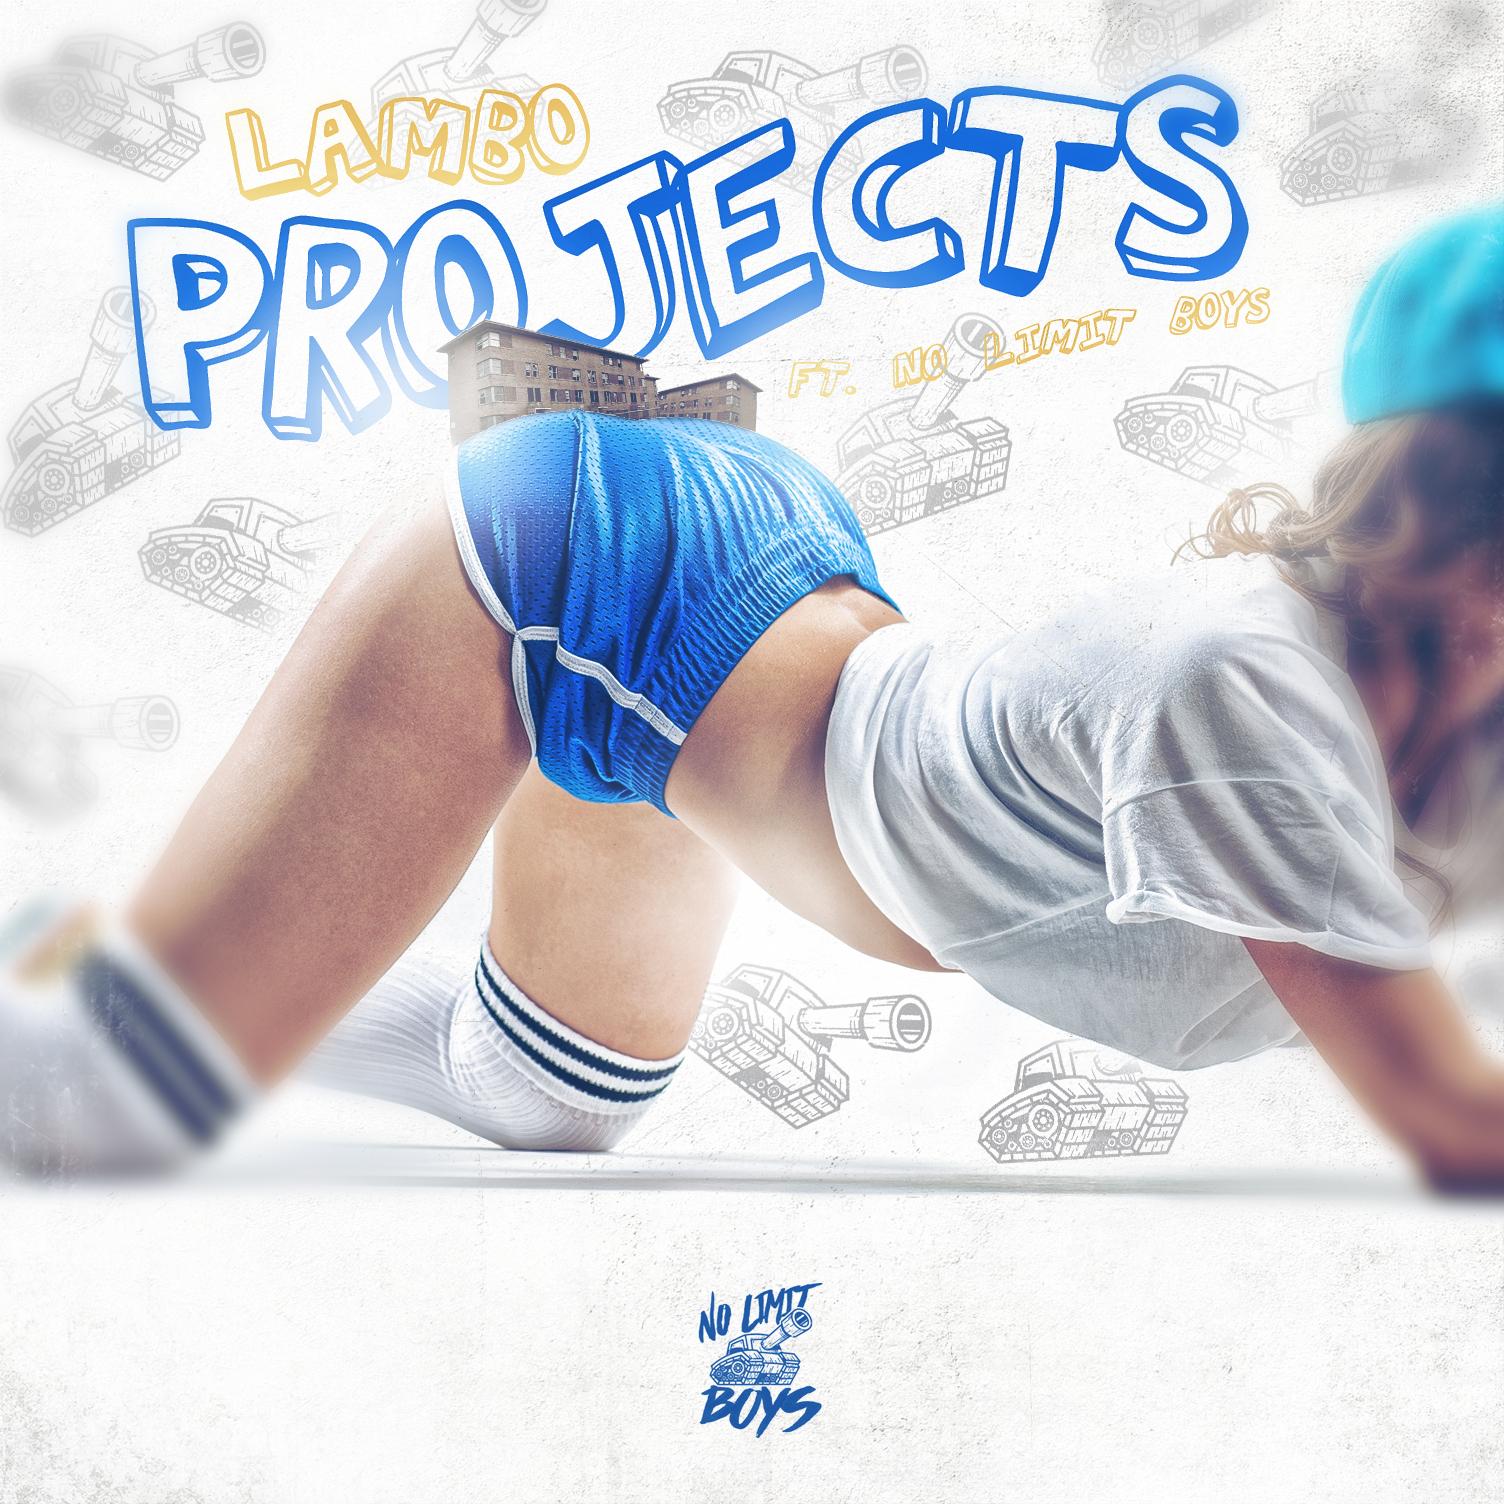 LAMBO_PROJECTS_COVERART